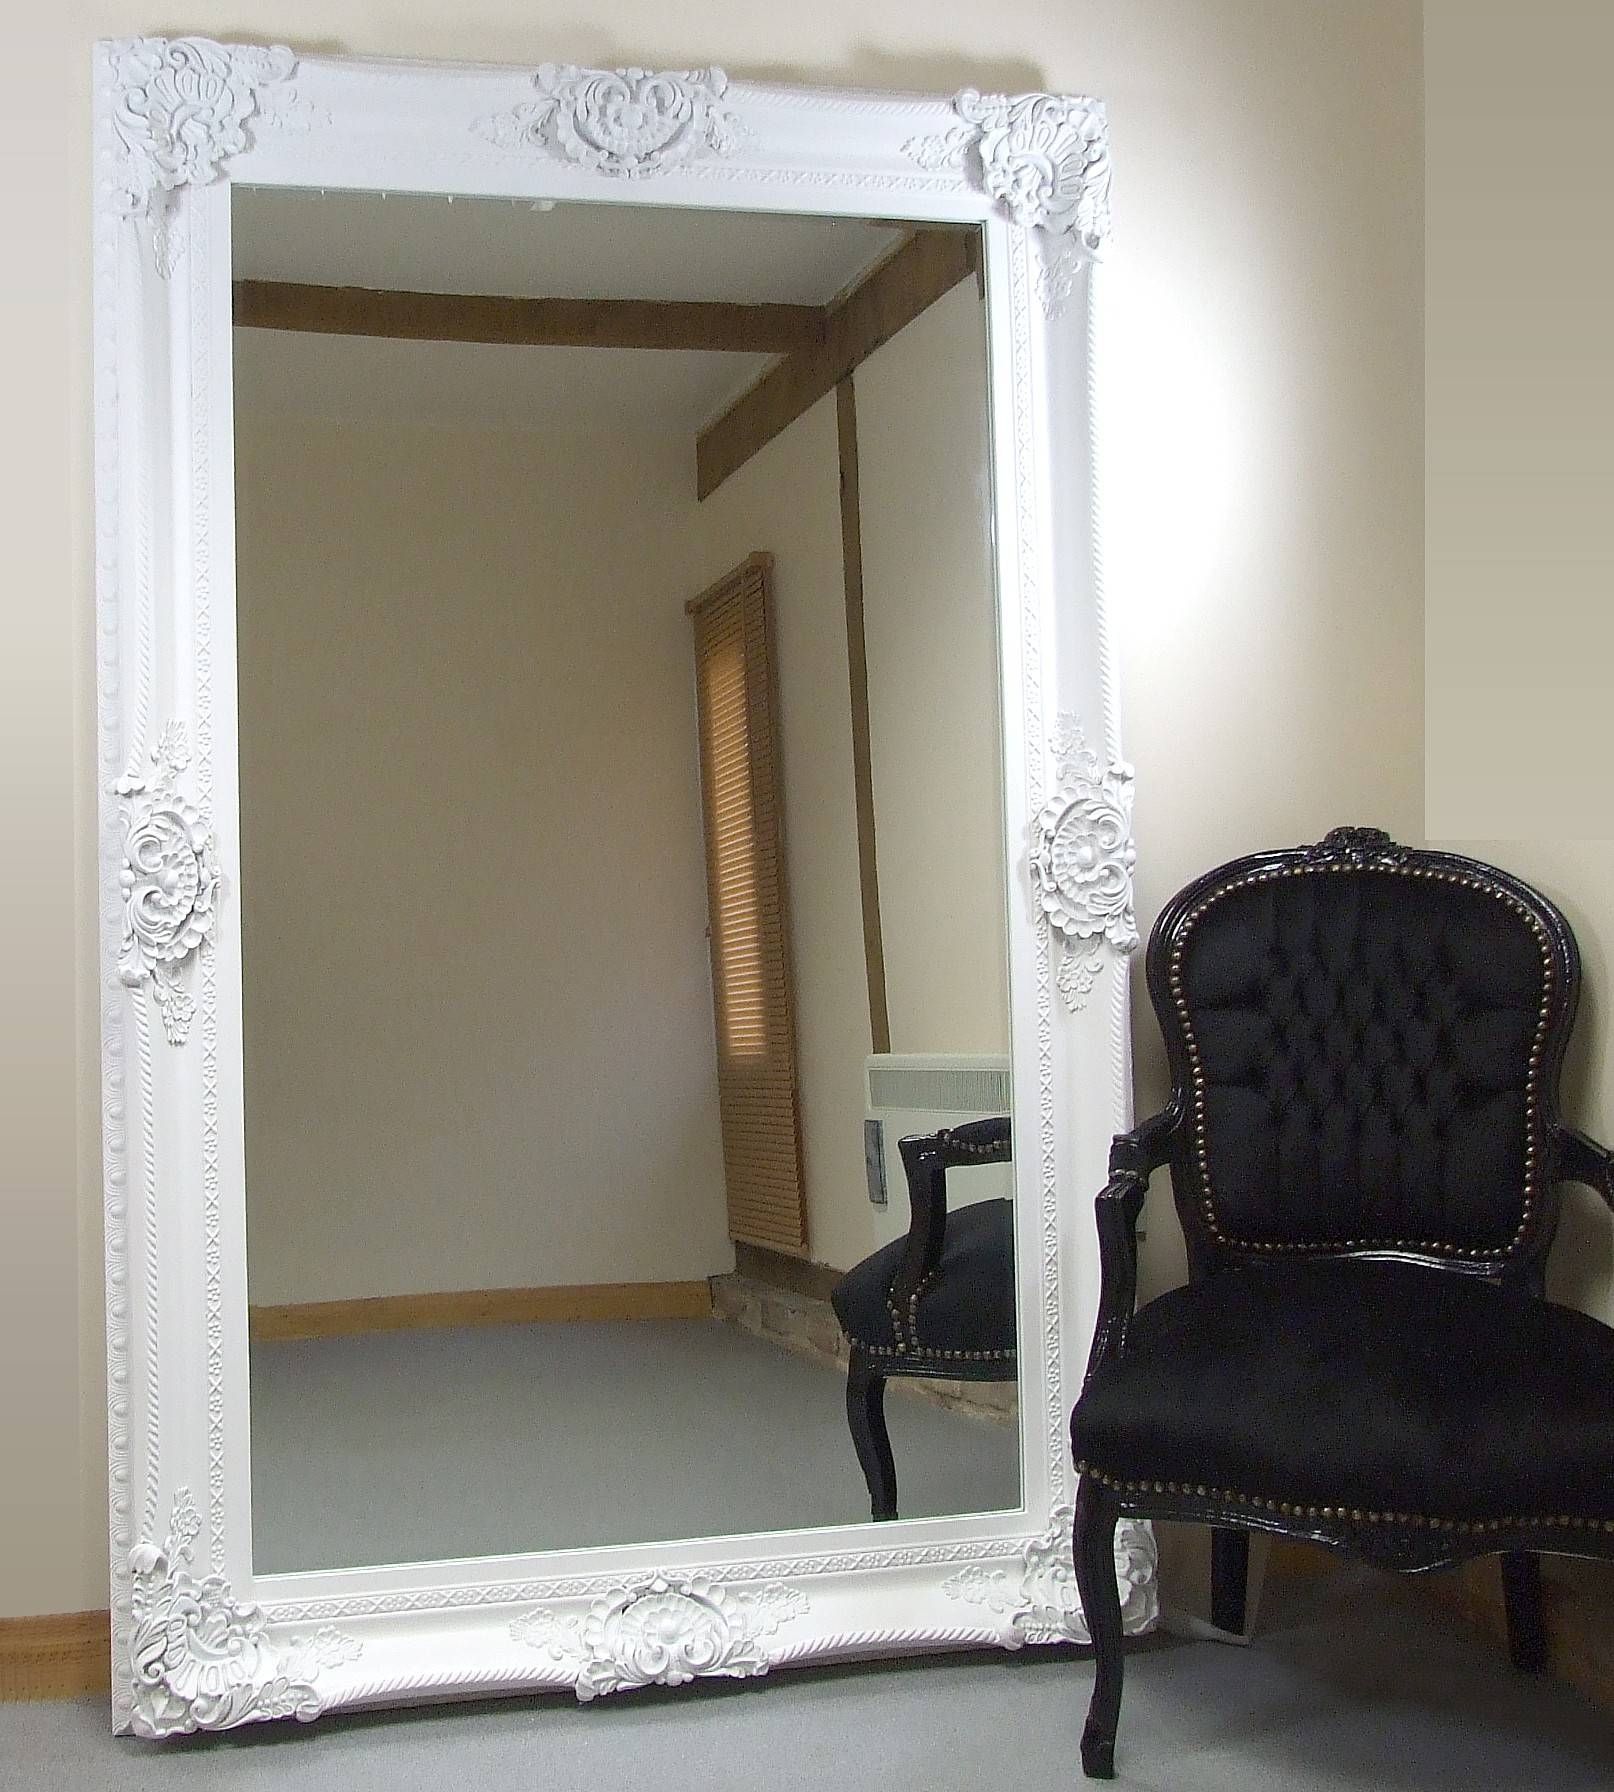 Seville Ornate Extra-Large French Full Length Wall Leaner Mirror for French Full Length Mirrors (Image 25 of 25)